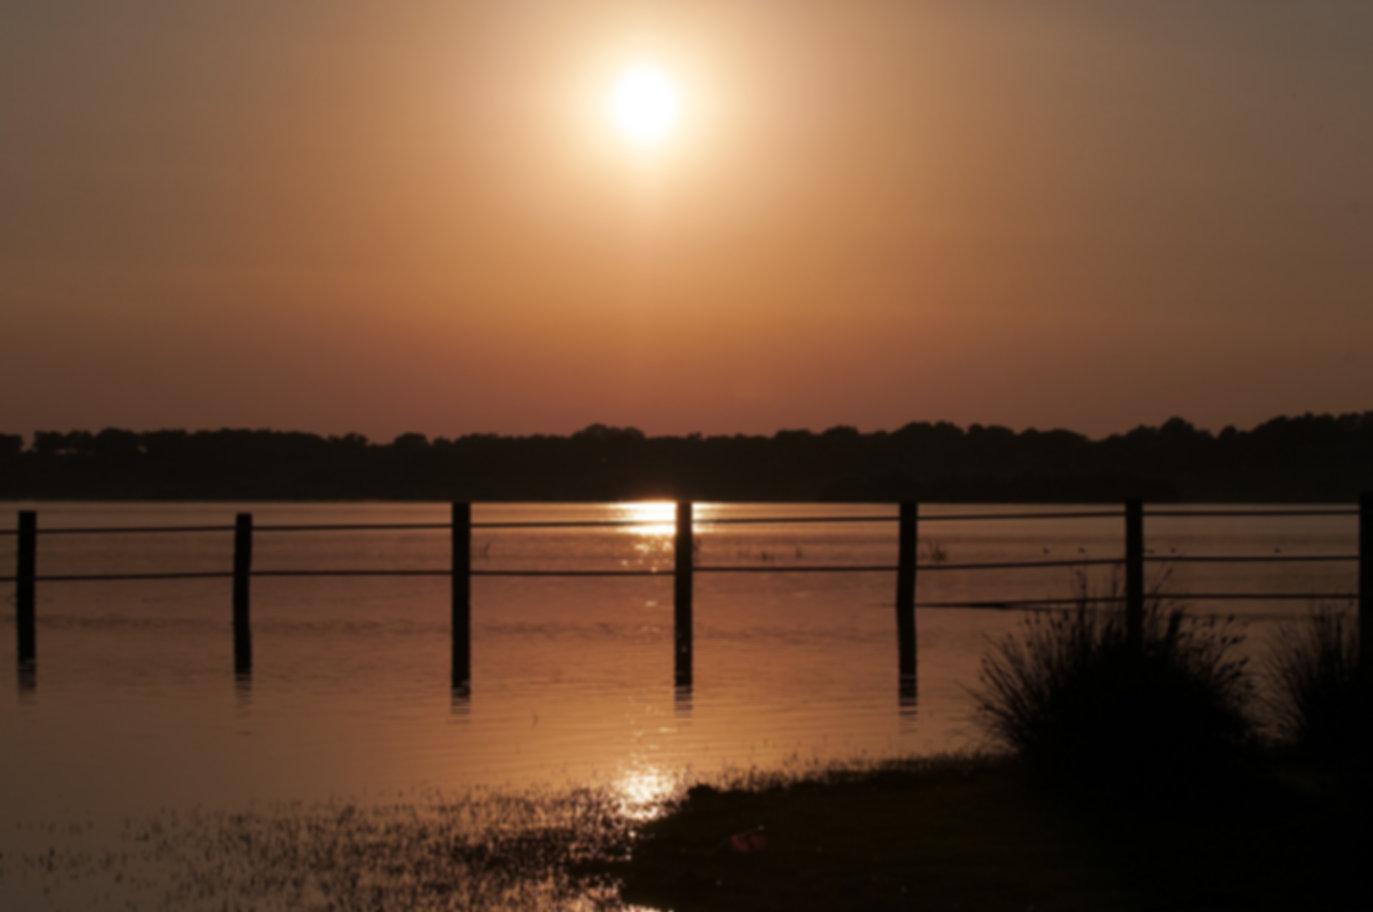 sunset-1192710_1920.jpg